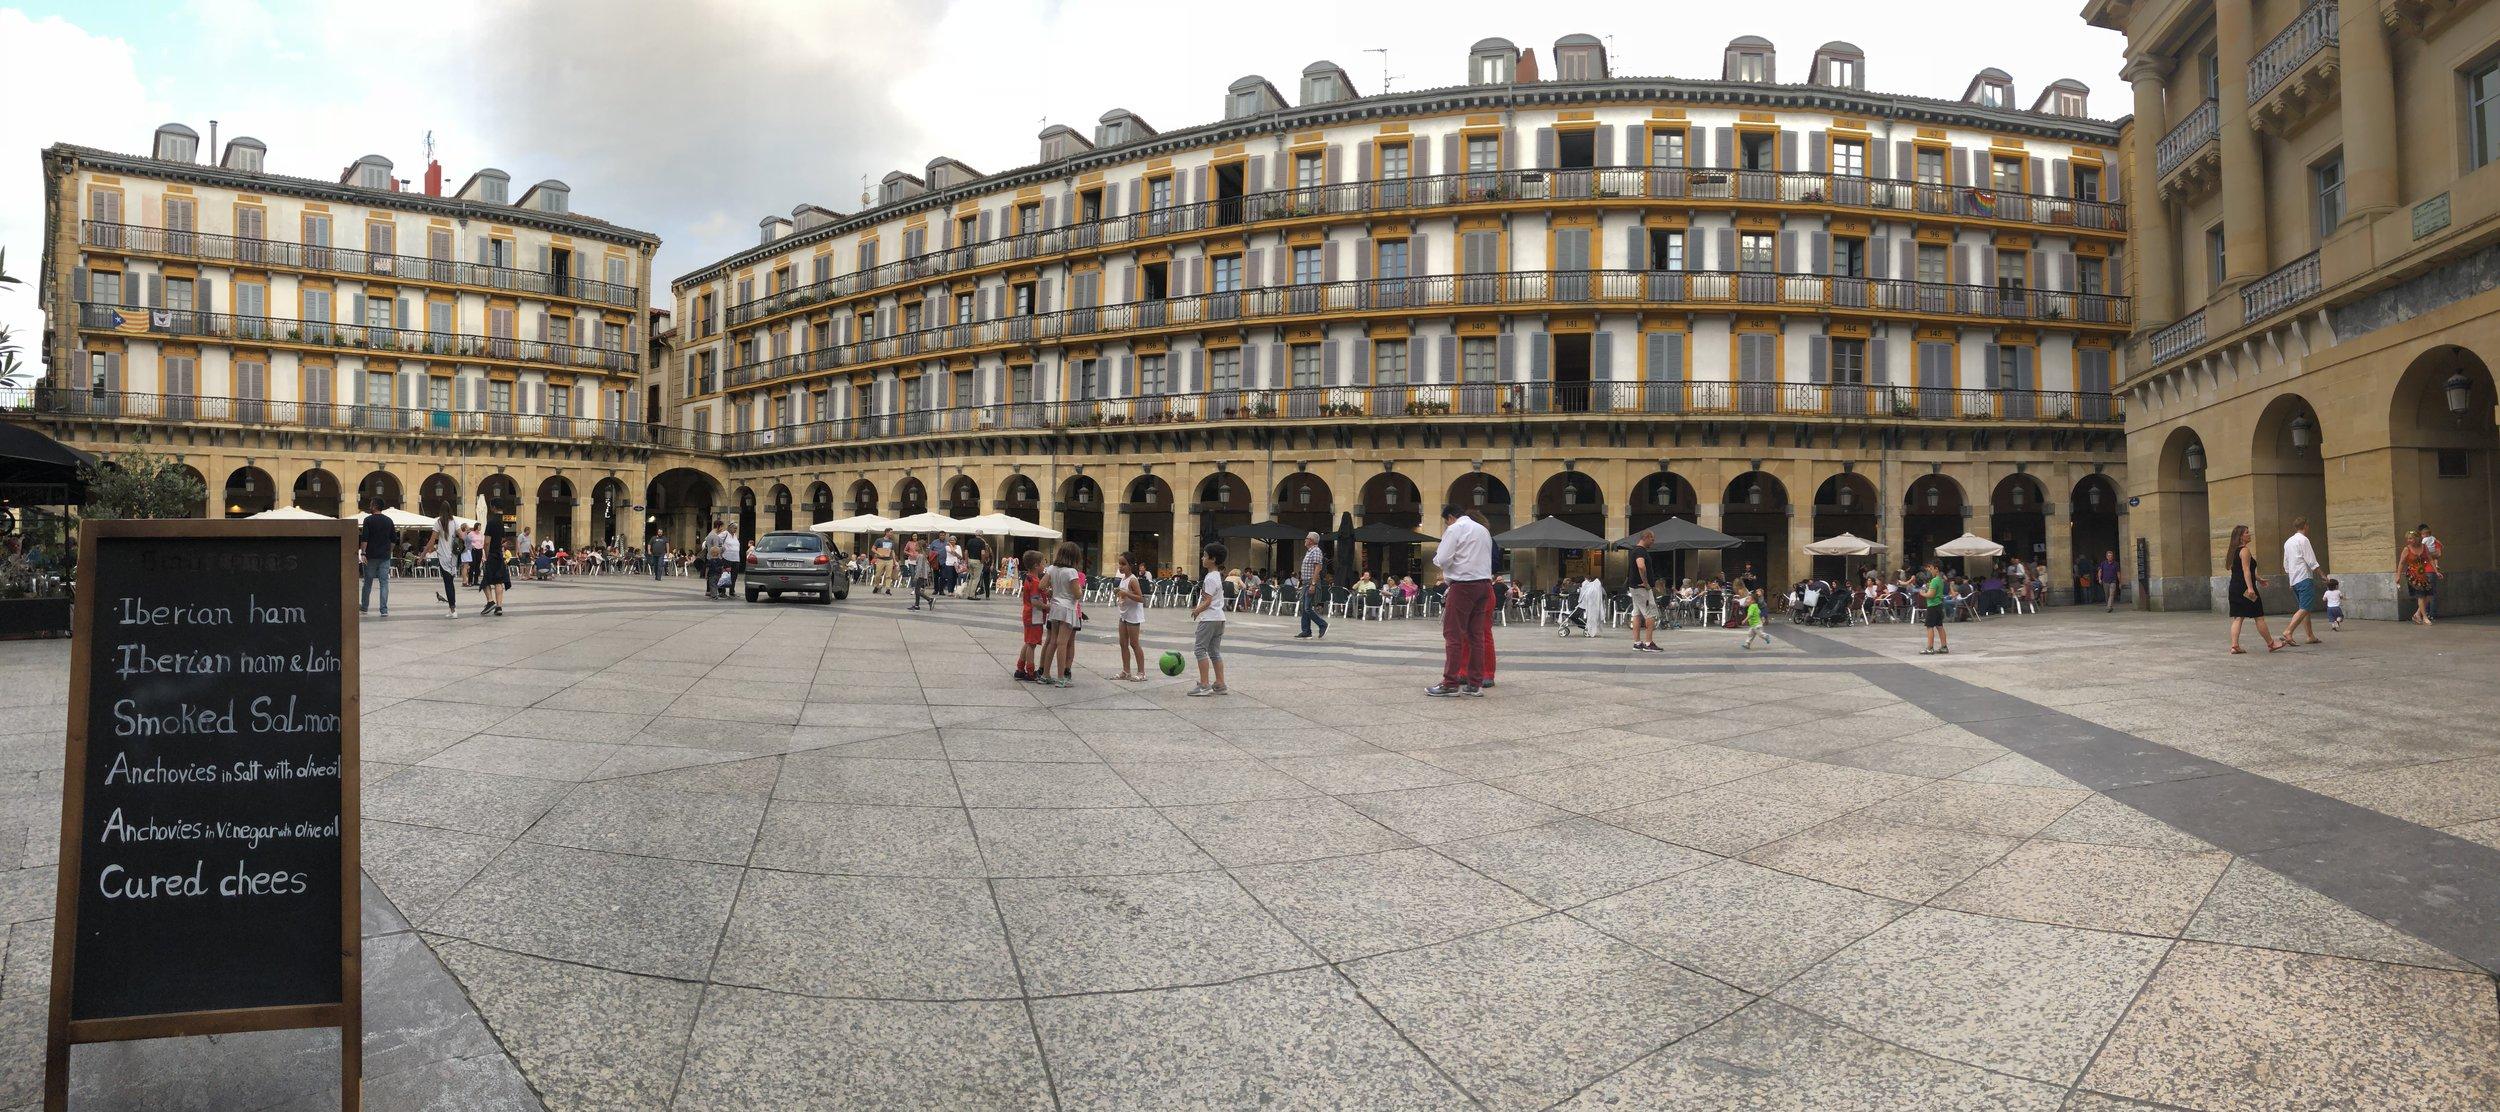 Plaza de la Constitucion